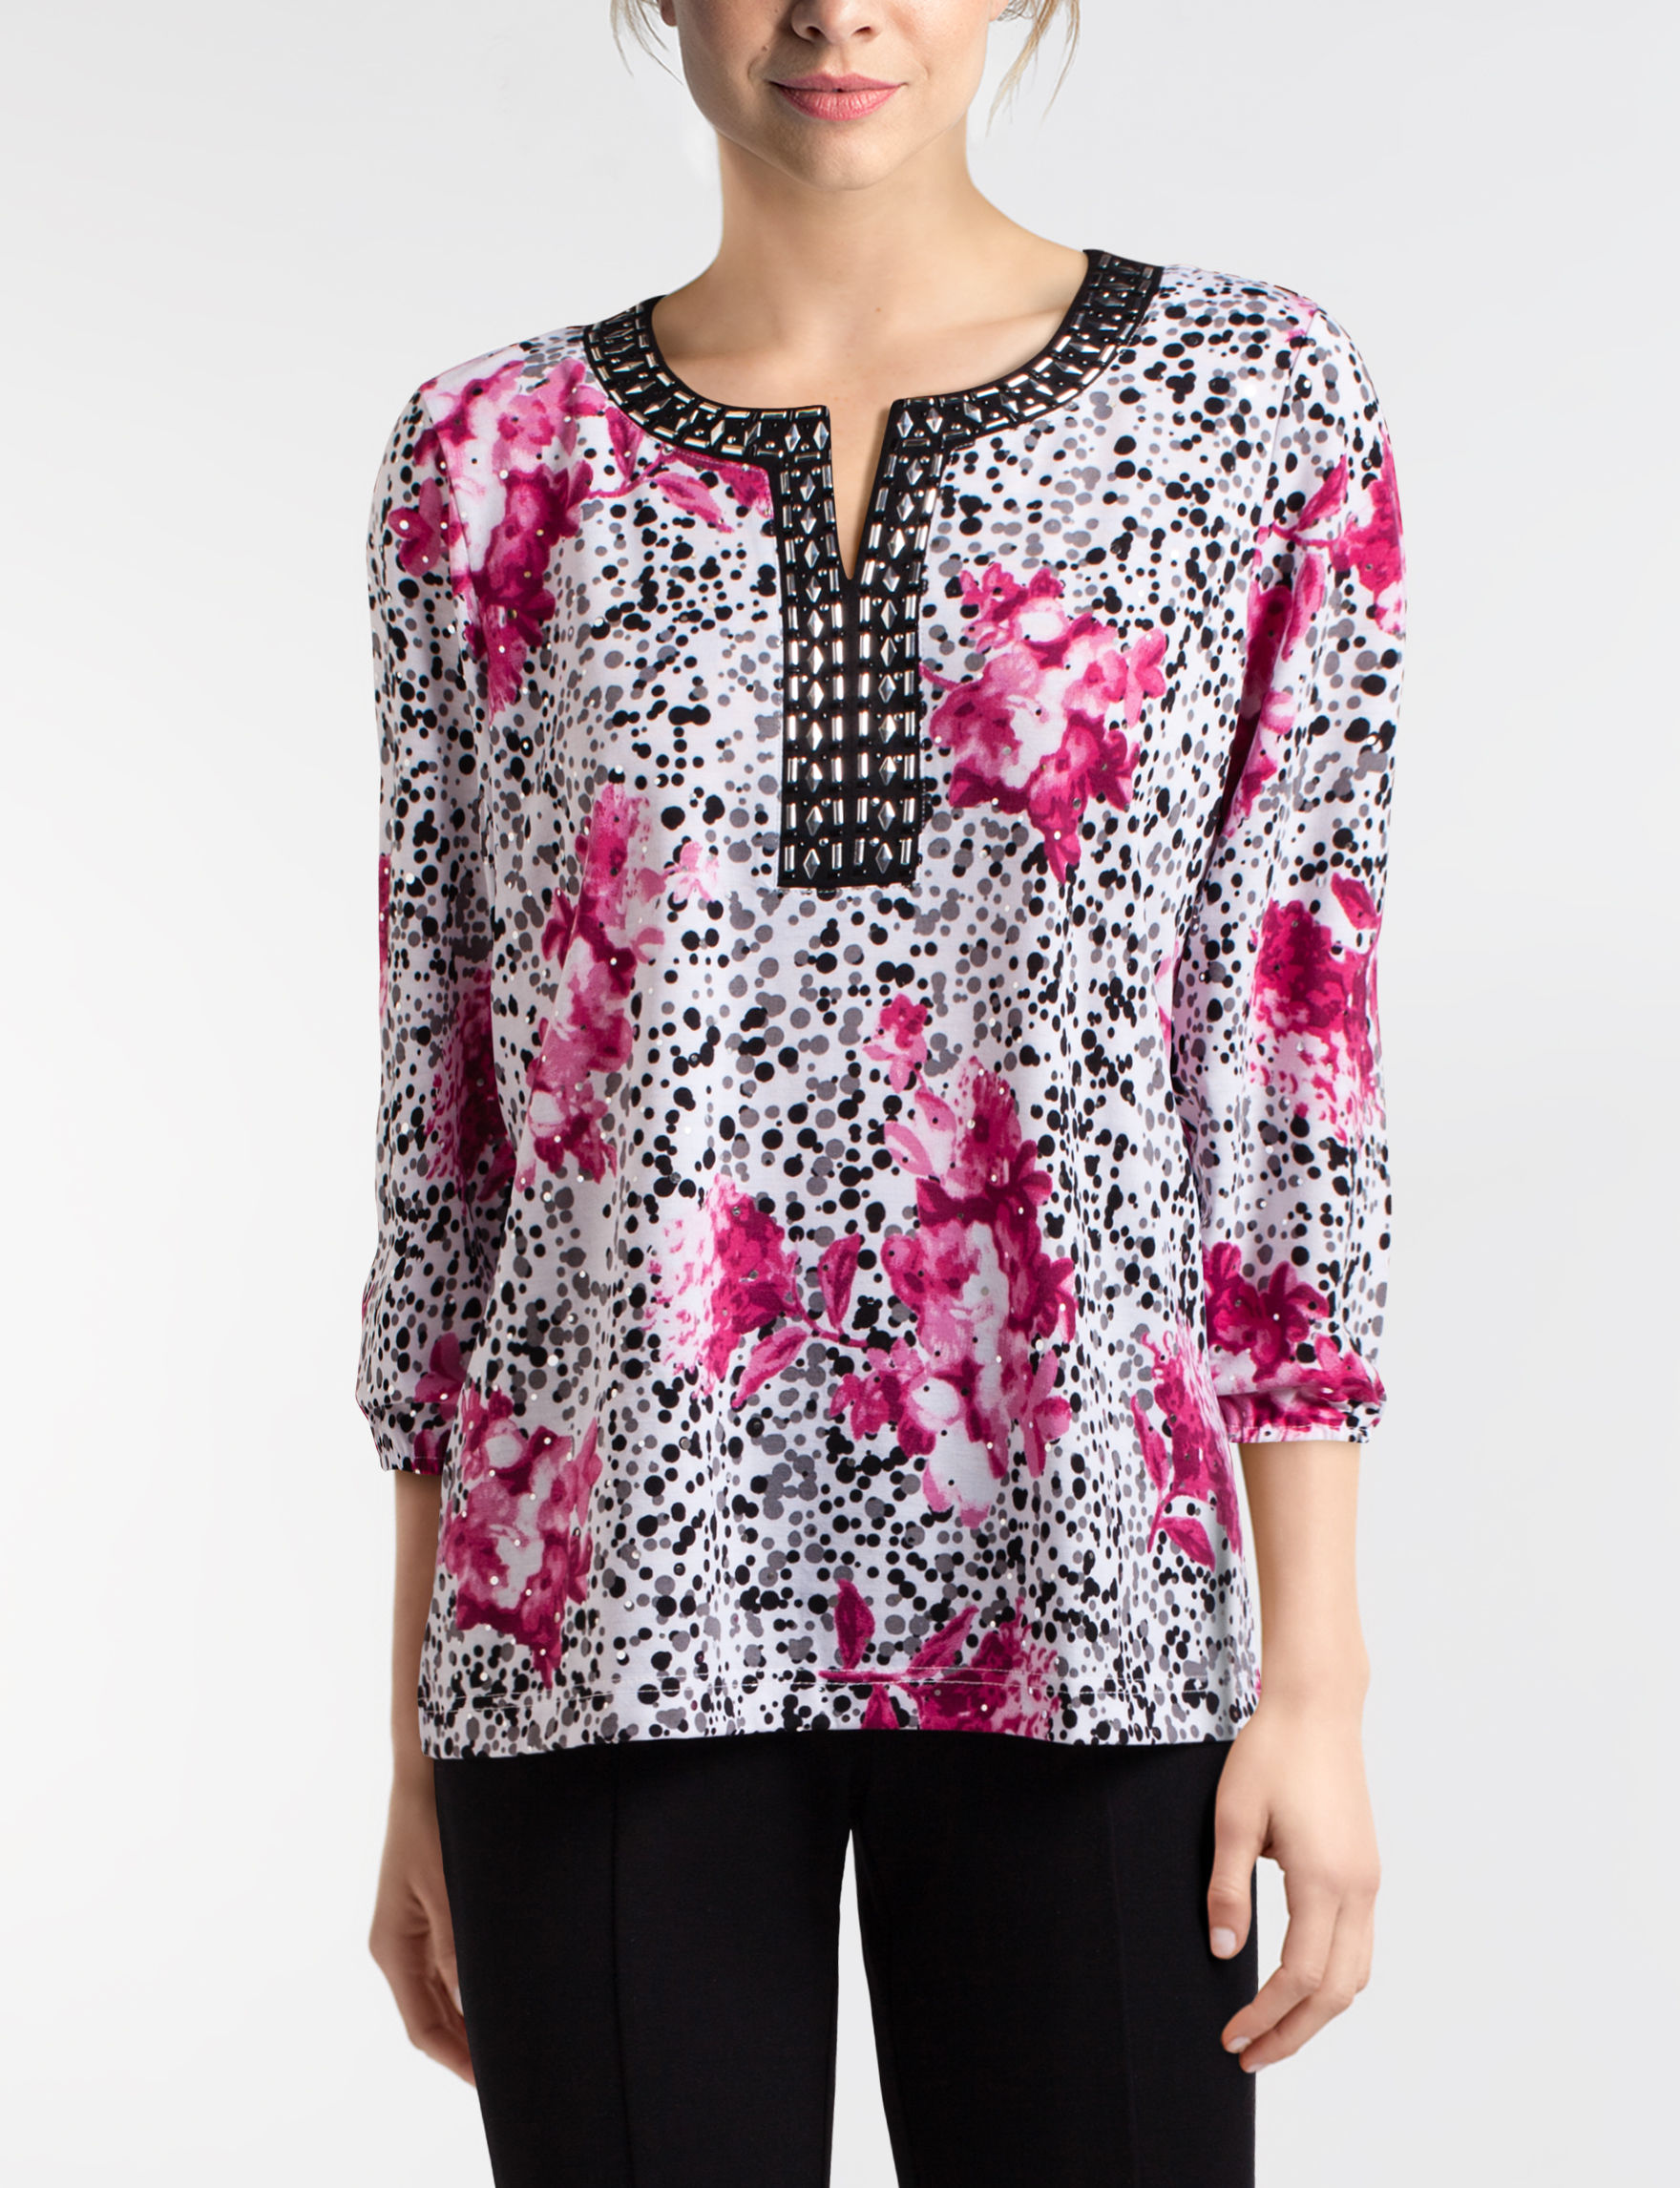 Cathy Daniels Black Multi Shirts & Blouses